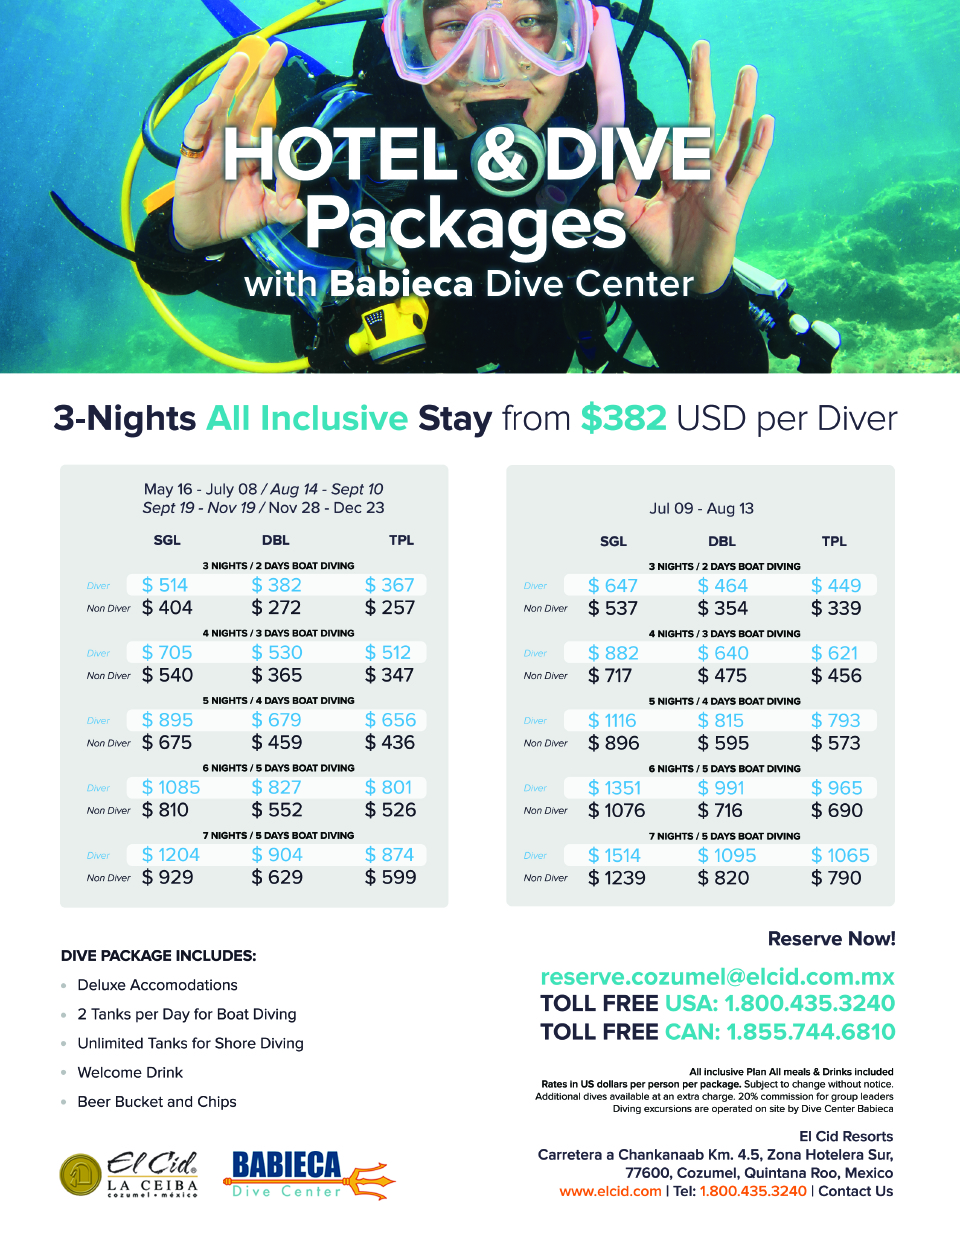 http://www.daemery.com/detm/promotions/2016-05Cozumel_Dive_Packages.jpg